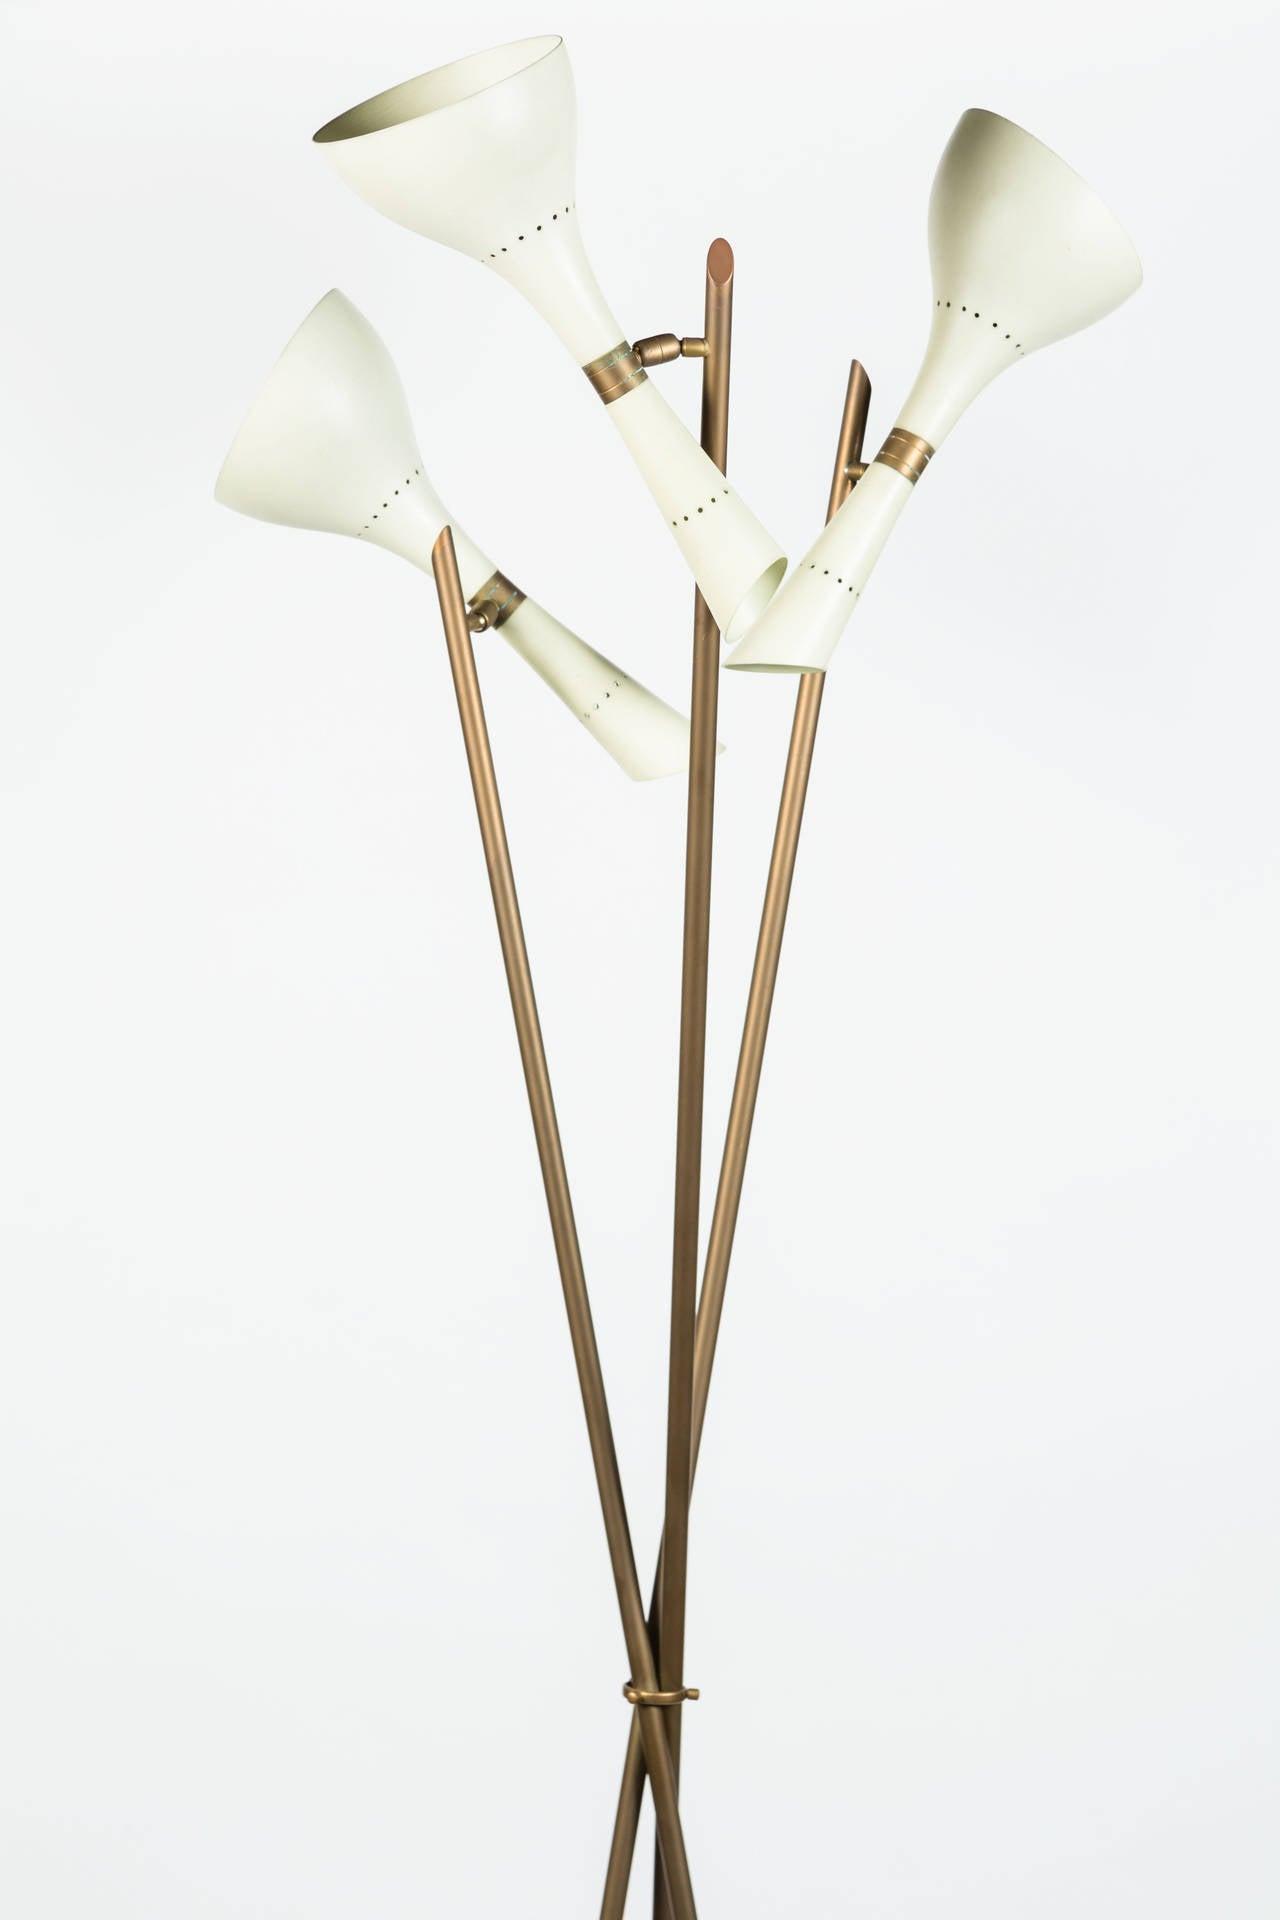 Painted Rare Angelo Lelli Floor Lamp for Arredoluce For Sale